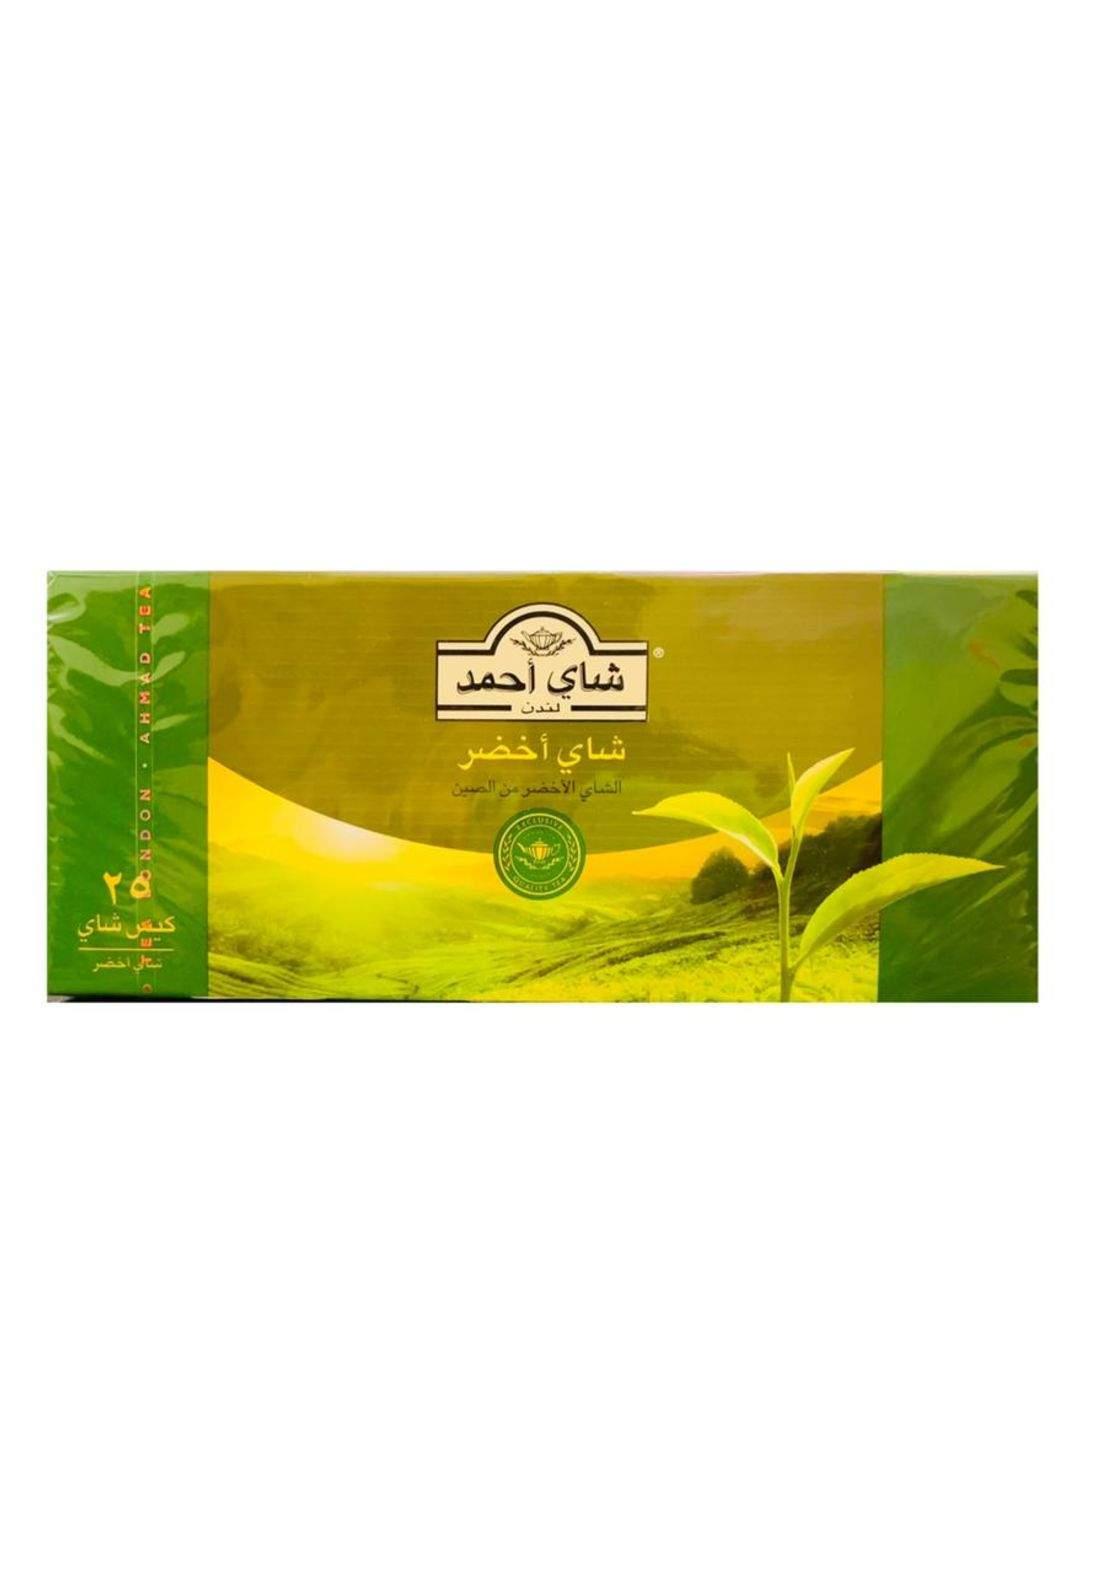 Ahmed green tea X25 شاي اخضر احمد